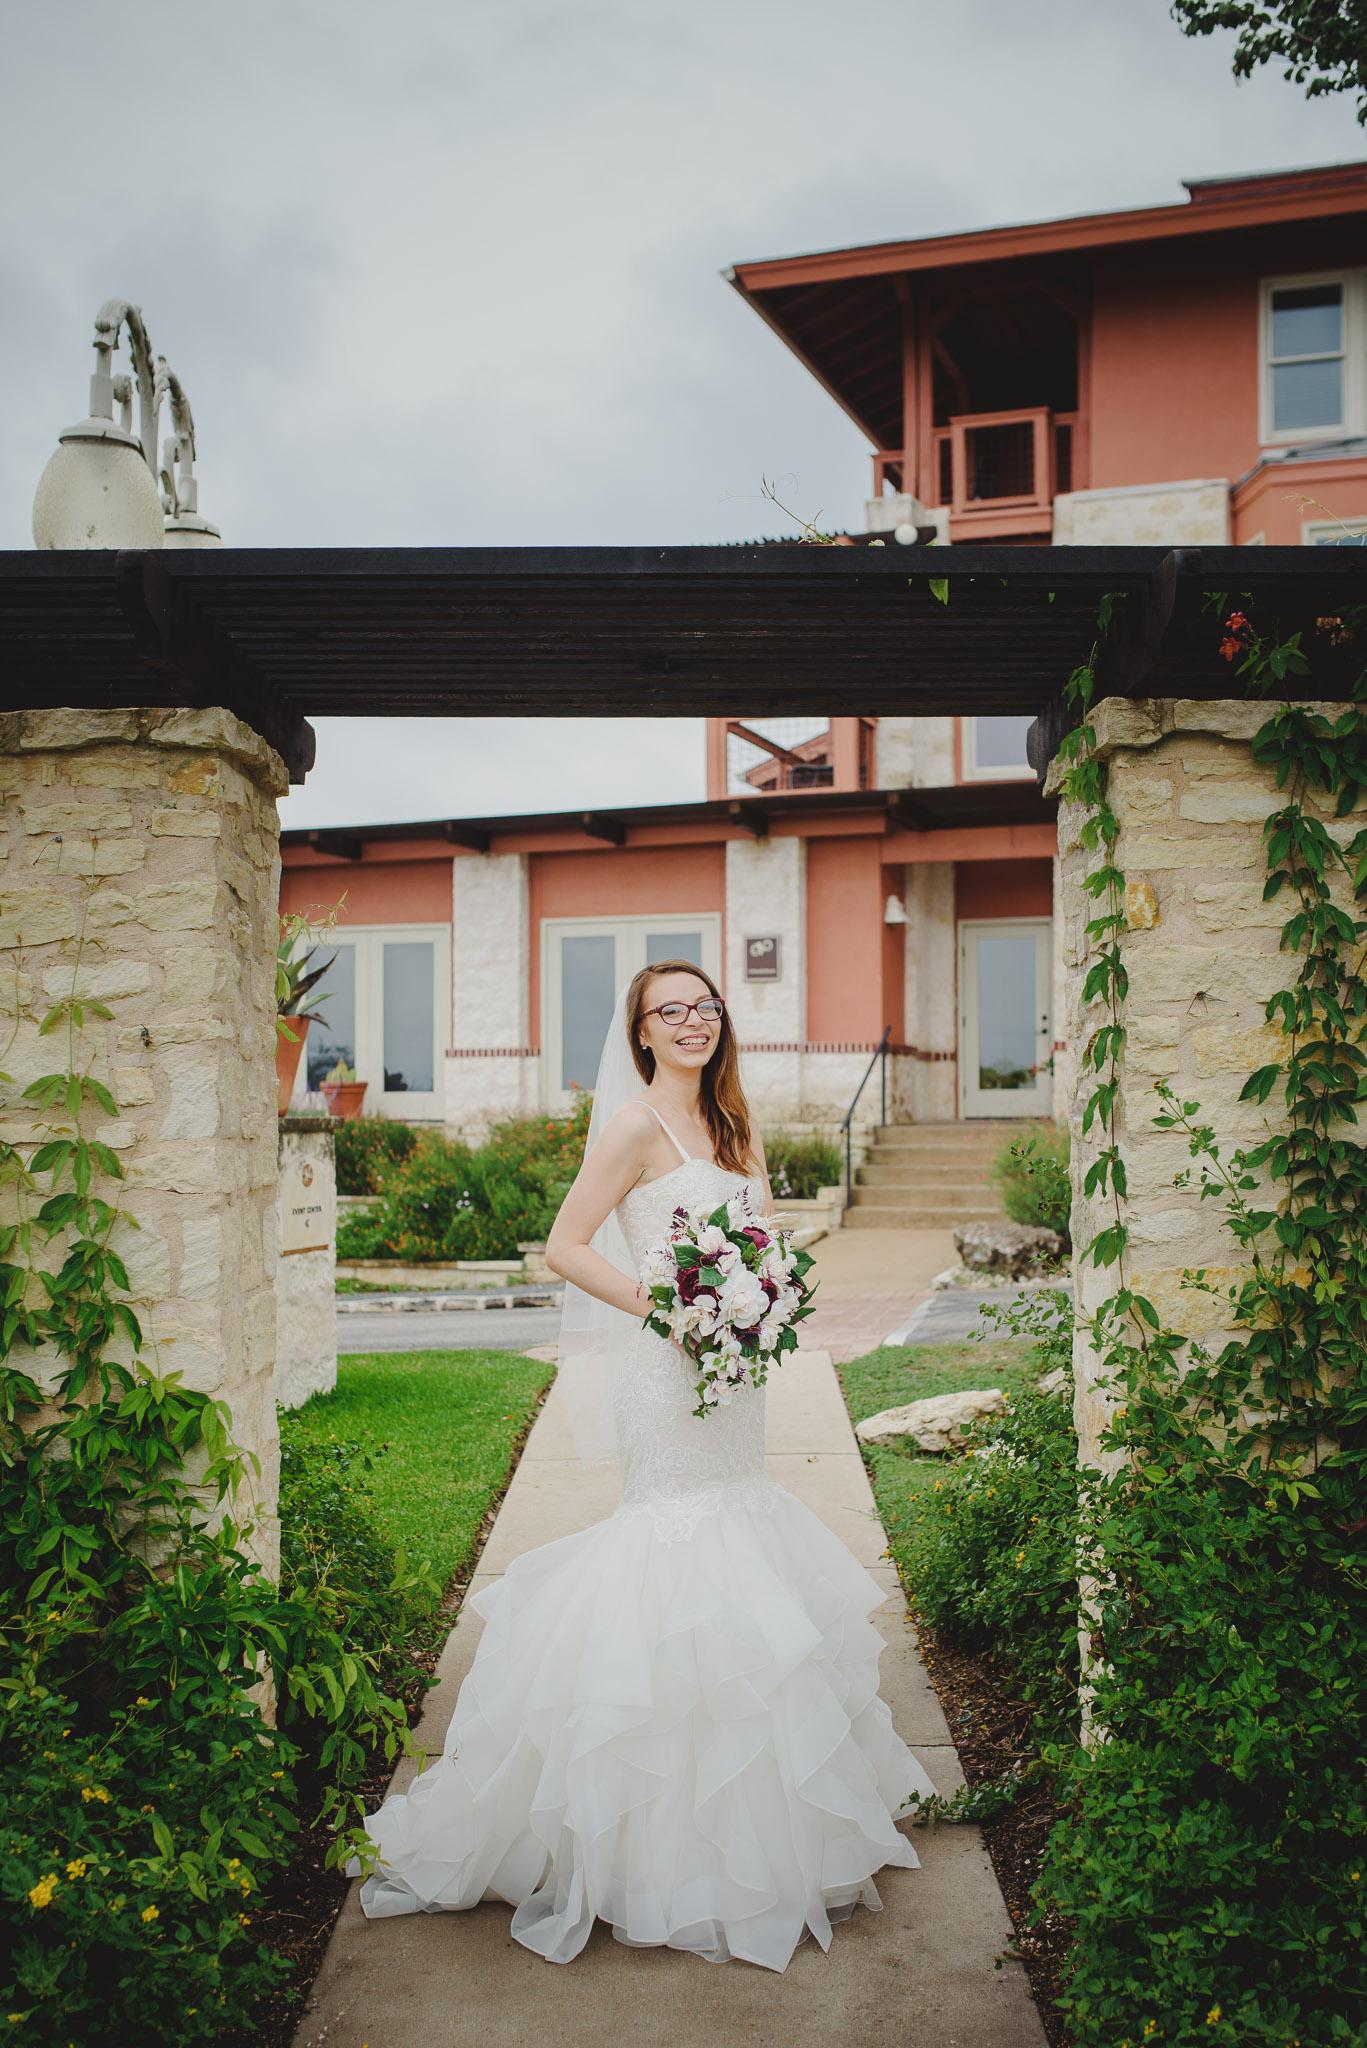 Austin-Texas-Wedding-Vintage-Villas-0048.jpg